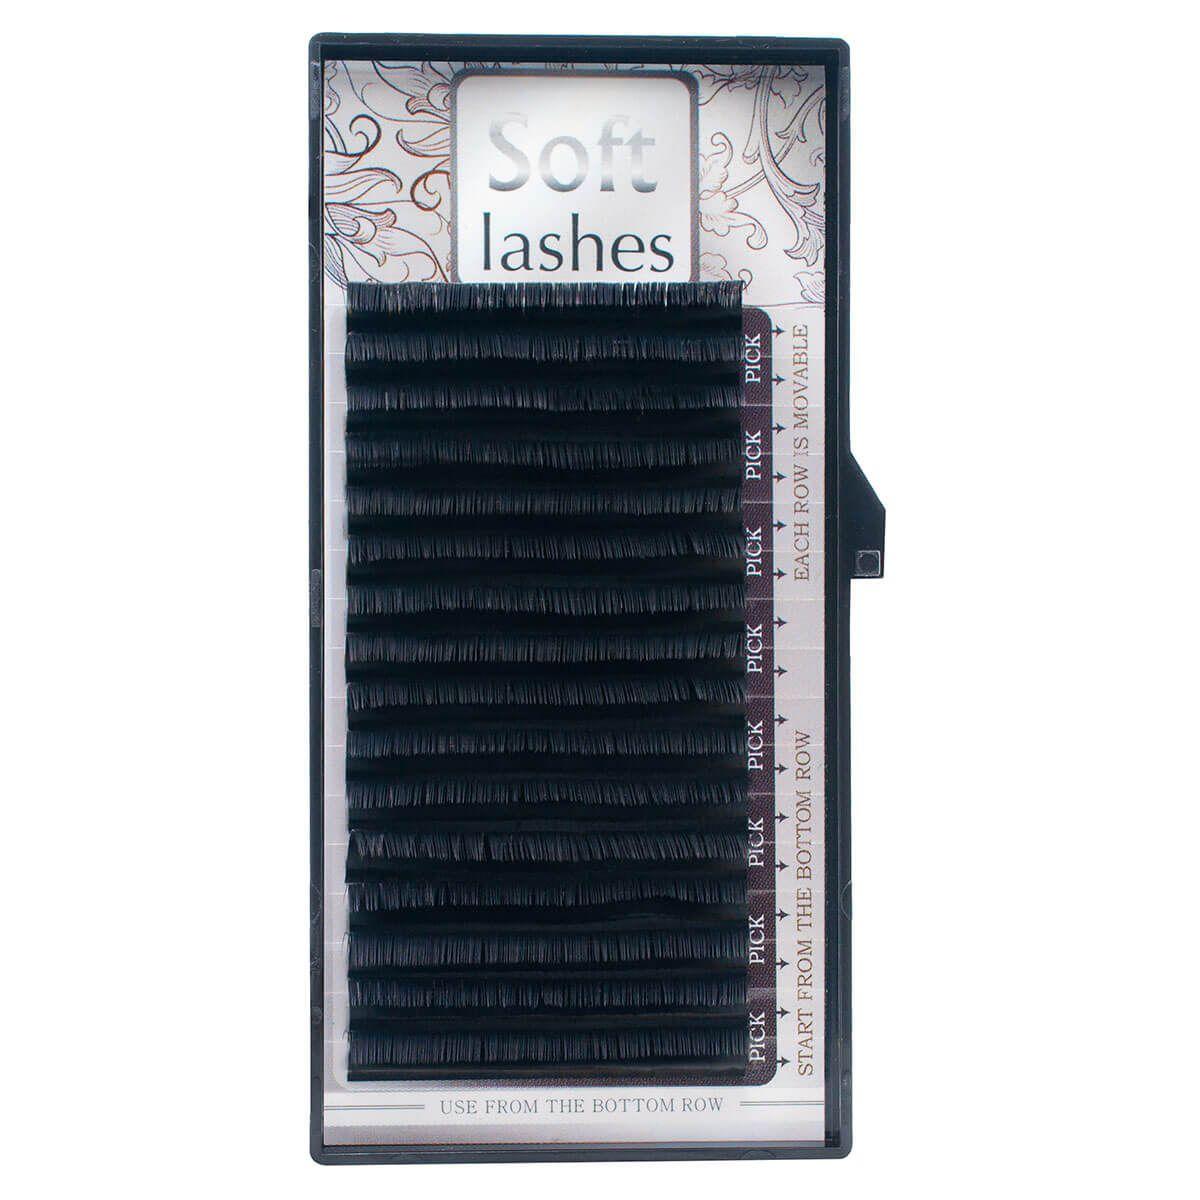 Cílios Eyelash Maker Soft Lashes 16 Fileiras Curvatura D